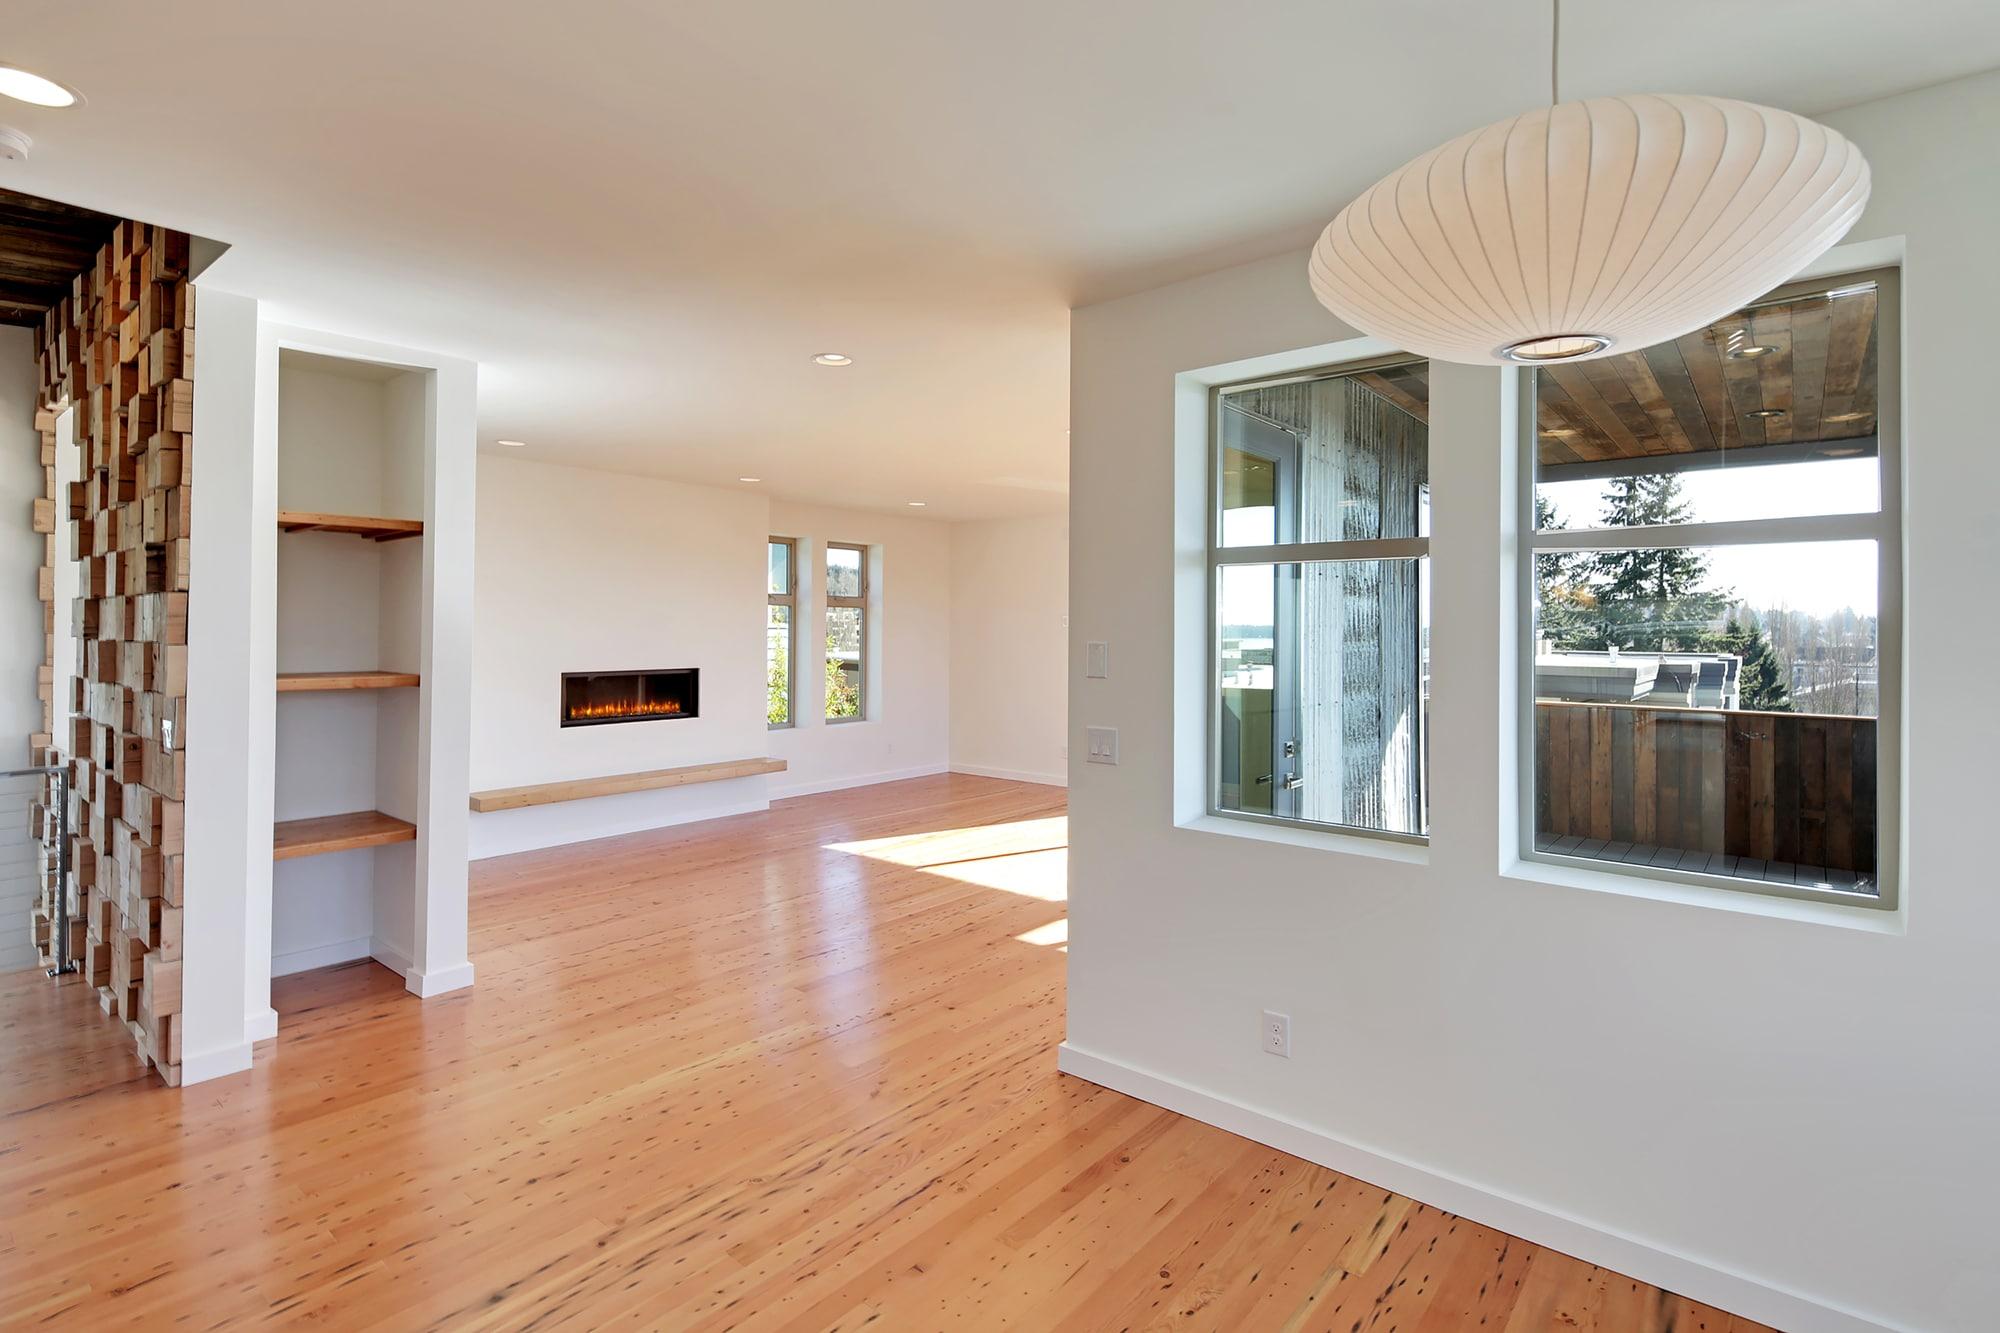 Dise o casa ecol gica autosuficiente planos for Pisos interiores